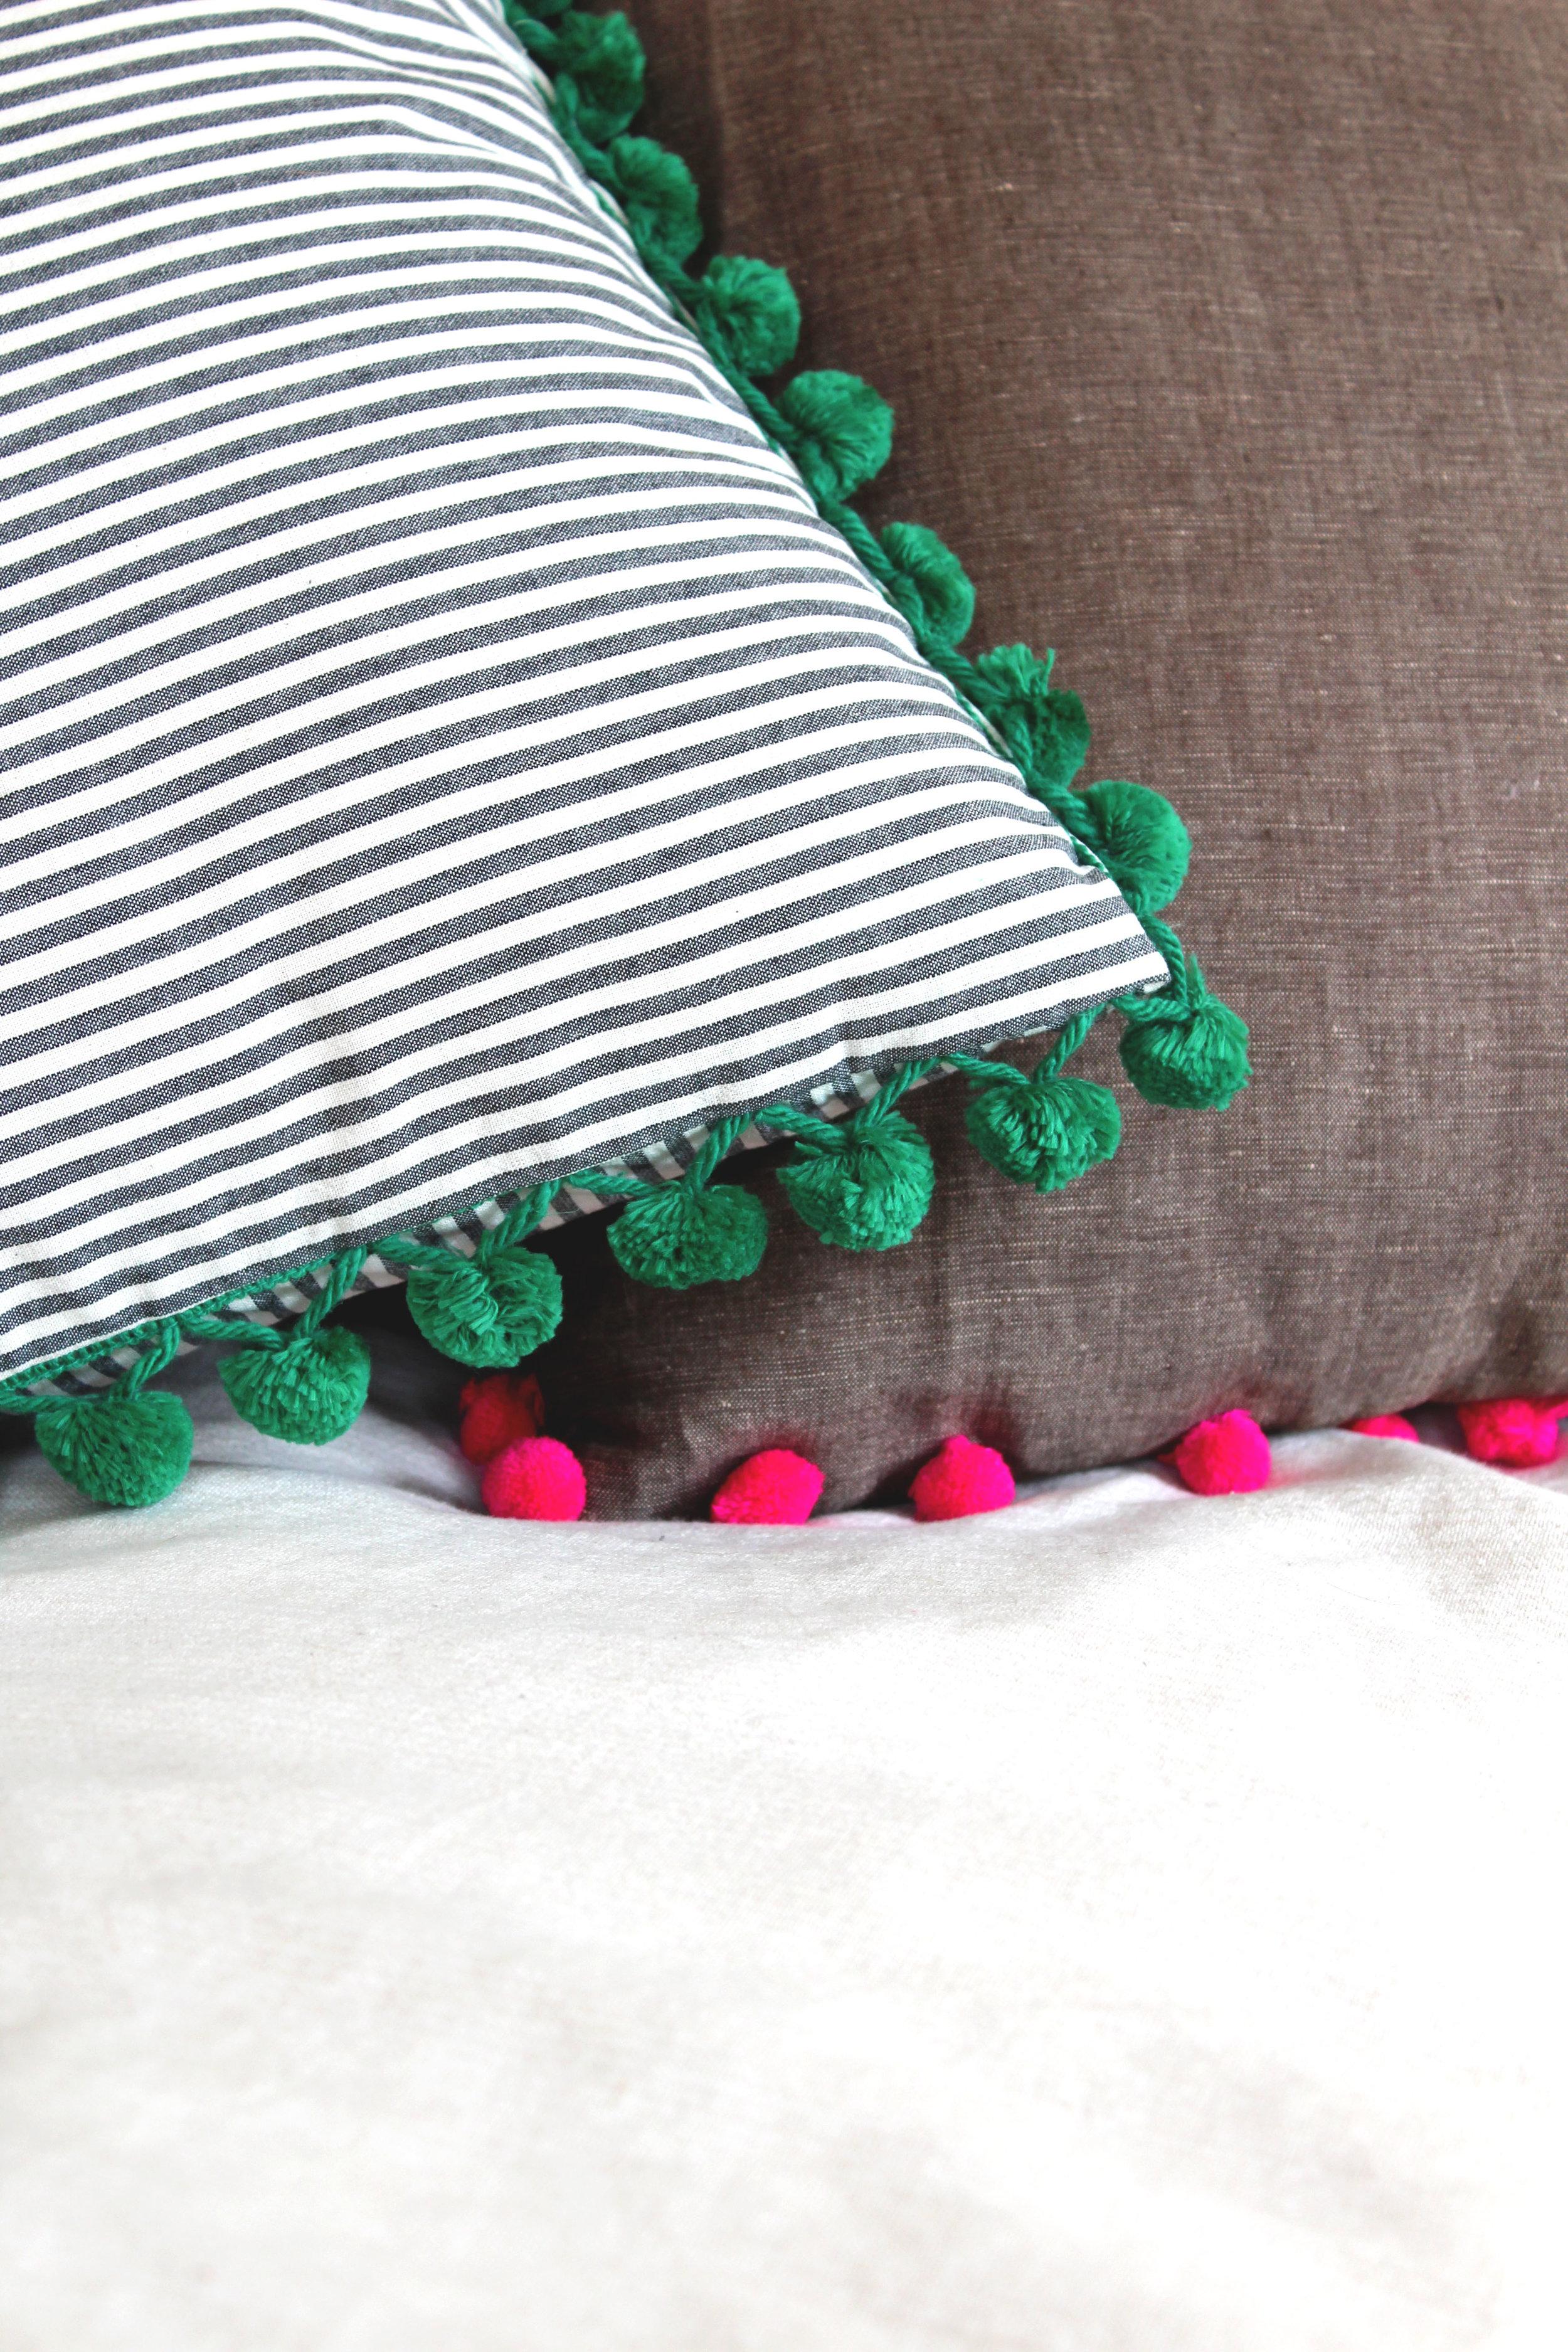 Pom Pom Pillows by Calhoun & Co.